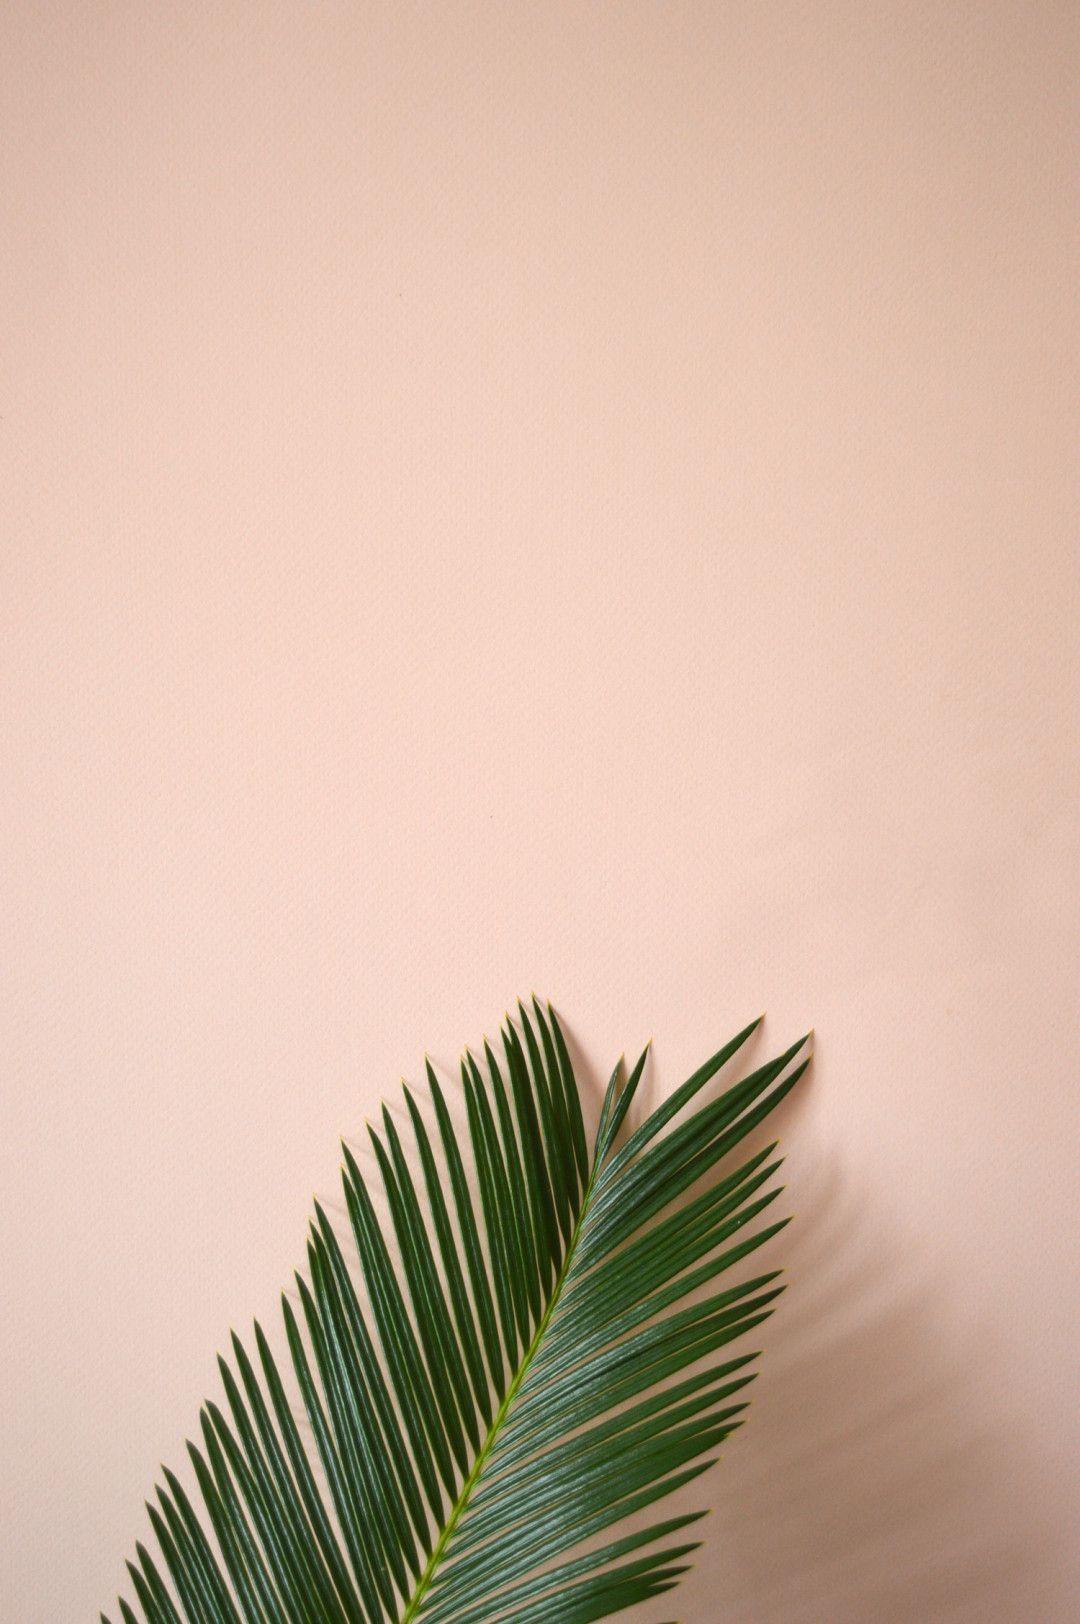 Pinterest L Hongphetc Plant Wallpaper Plants Plant Aesthetic